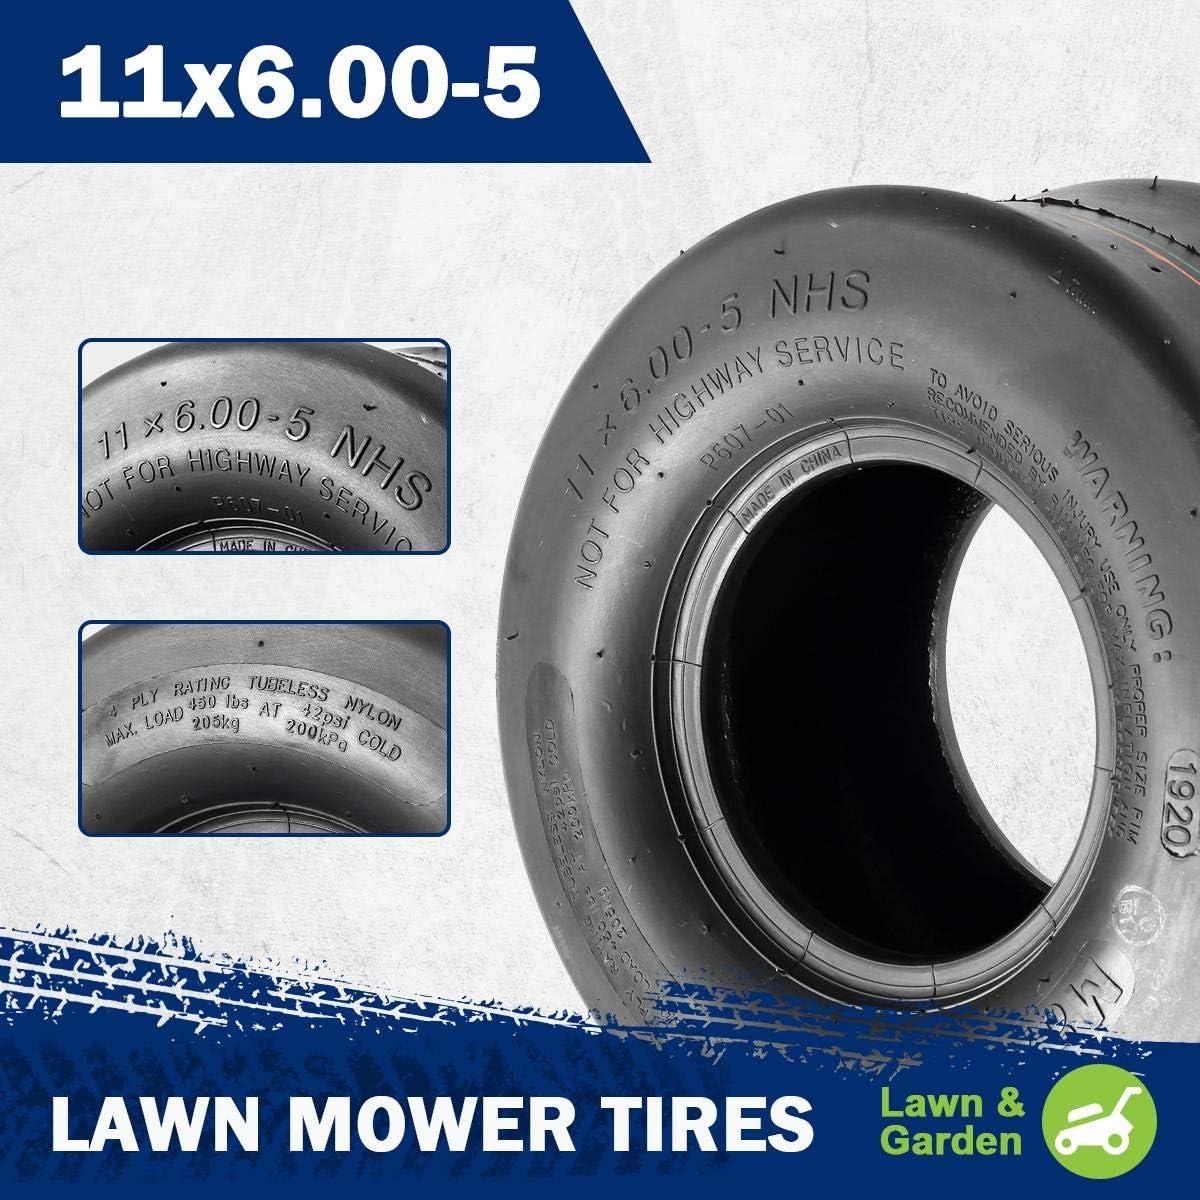 MaxAuto 11x6.00-5 Smooth Lawn /& Garden Tire for Zero Turn Mower or Go-Kart,2Pcs